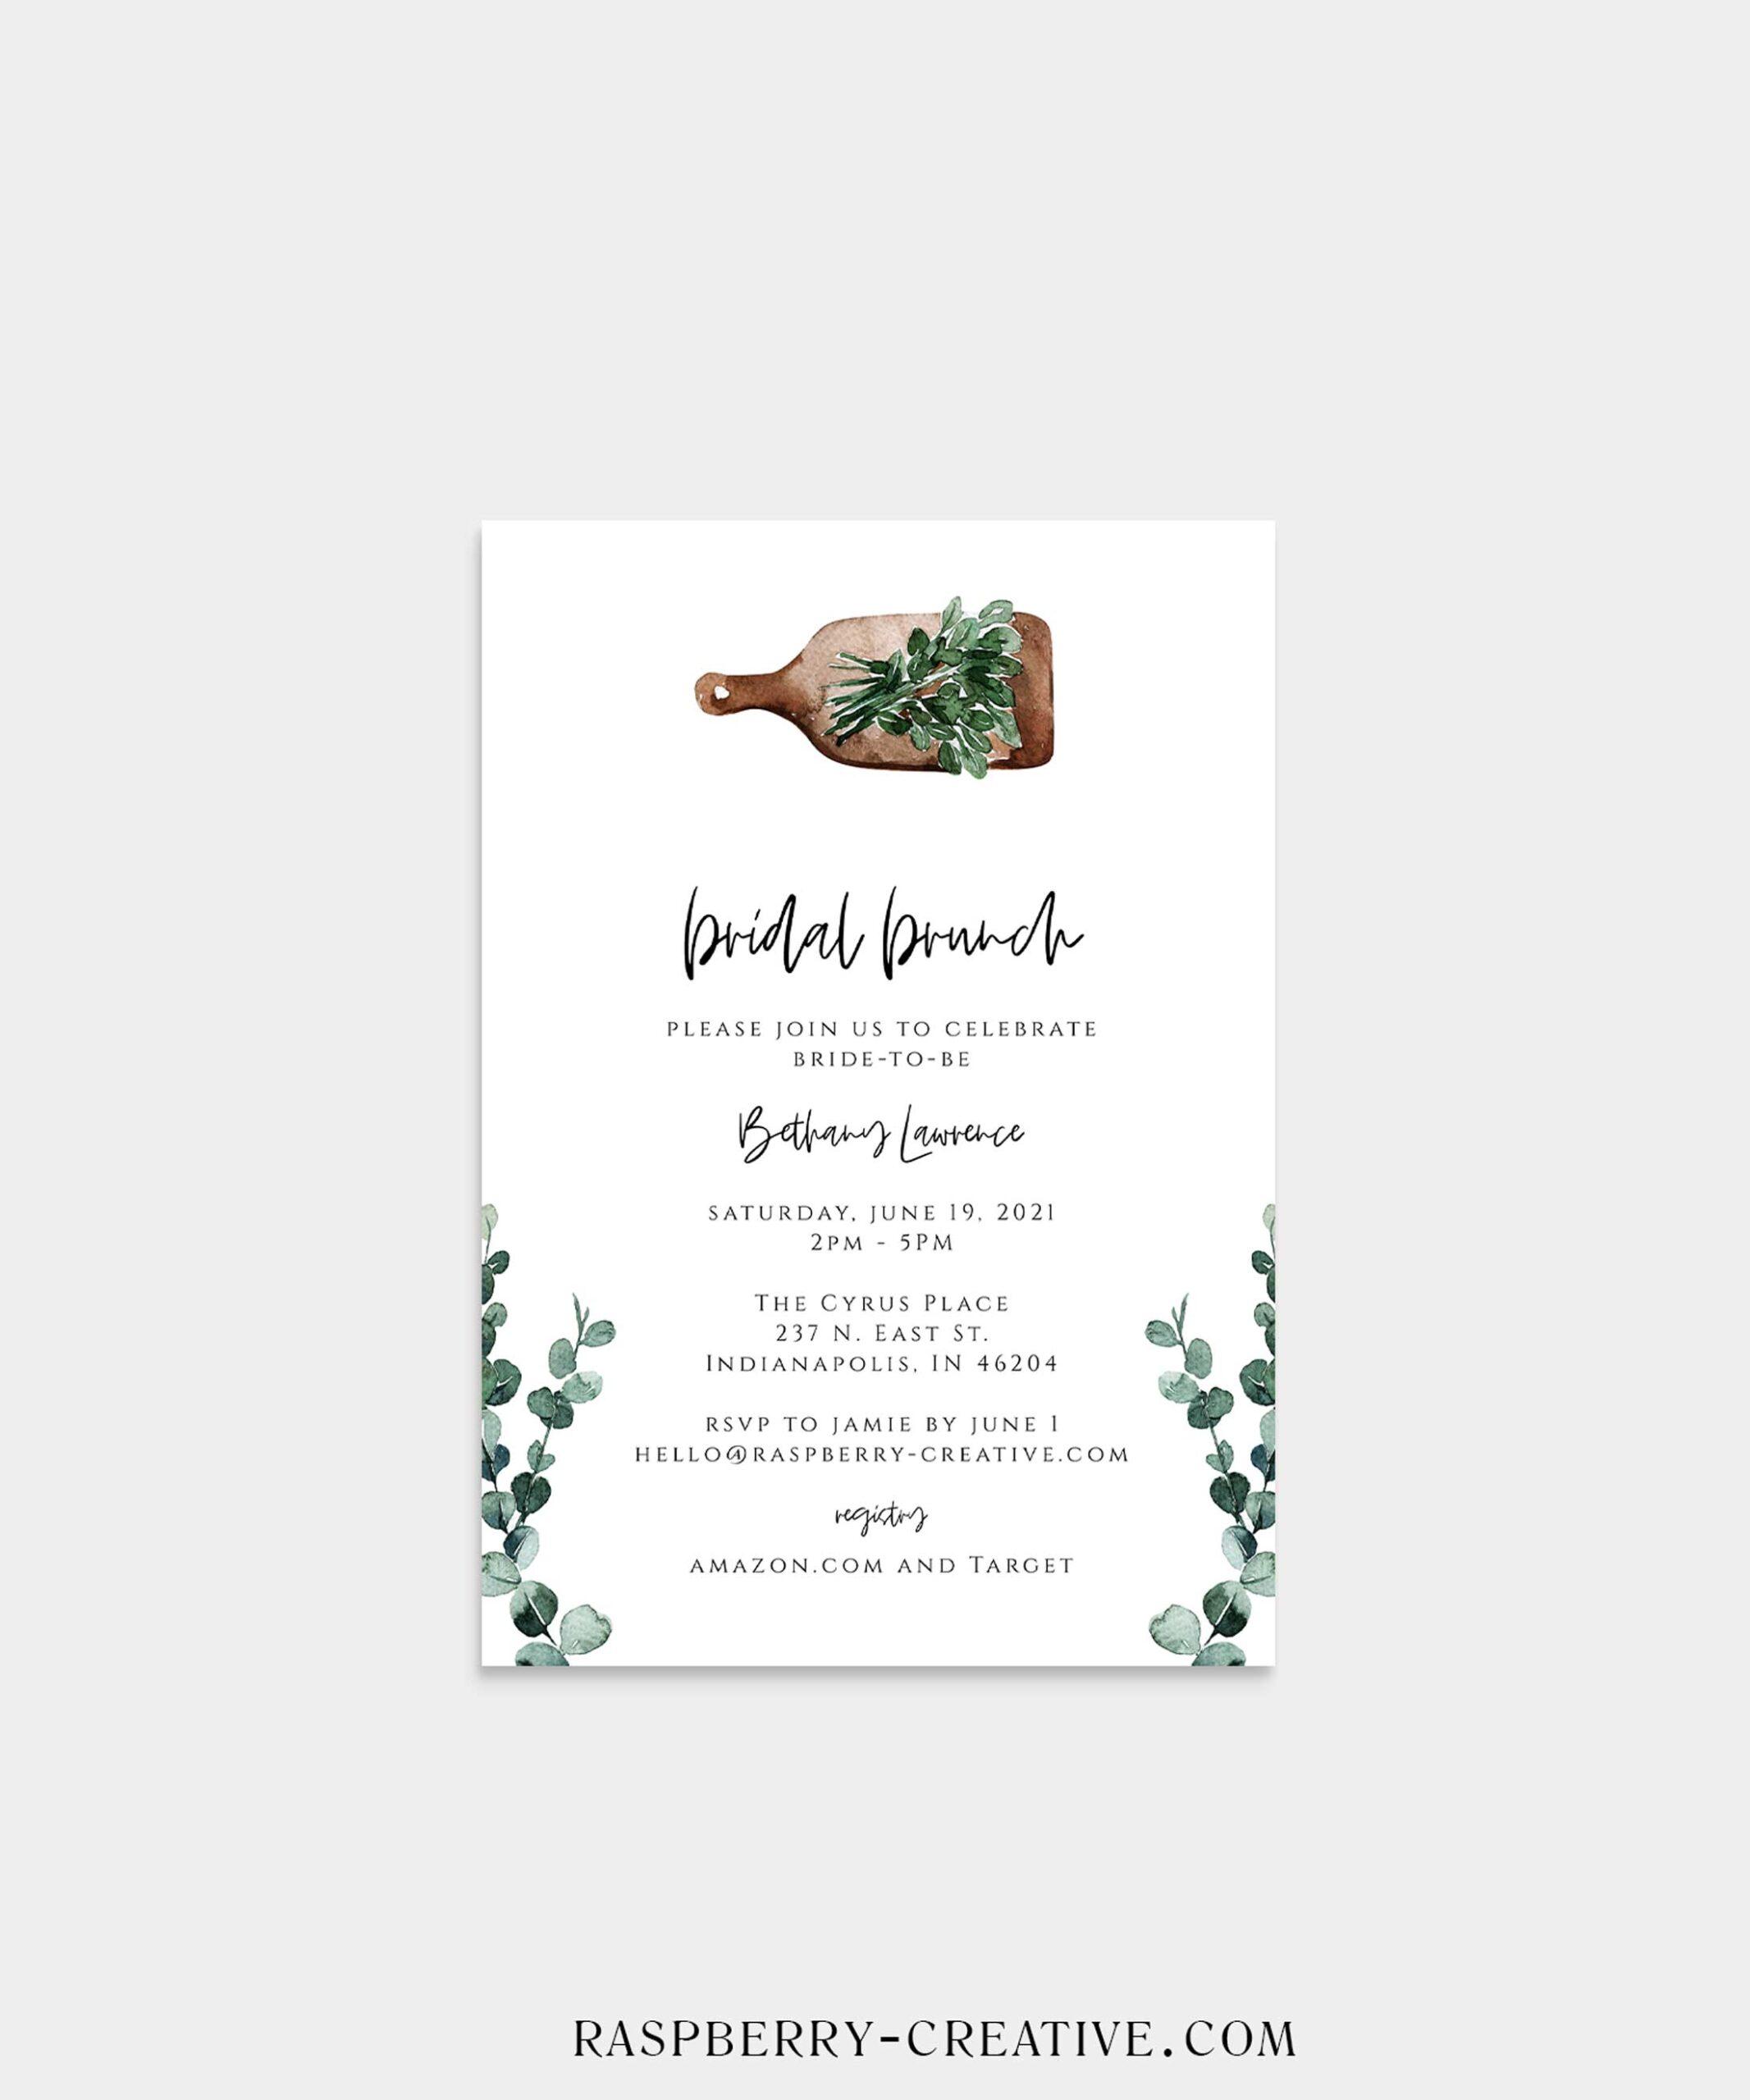 greenery breadboard bridal shower invitation